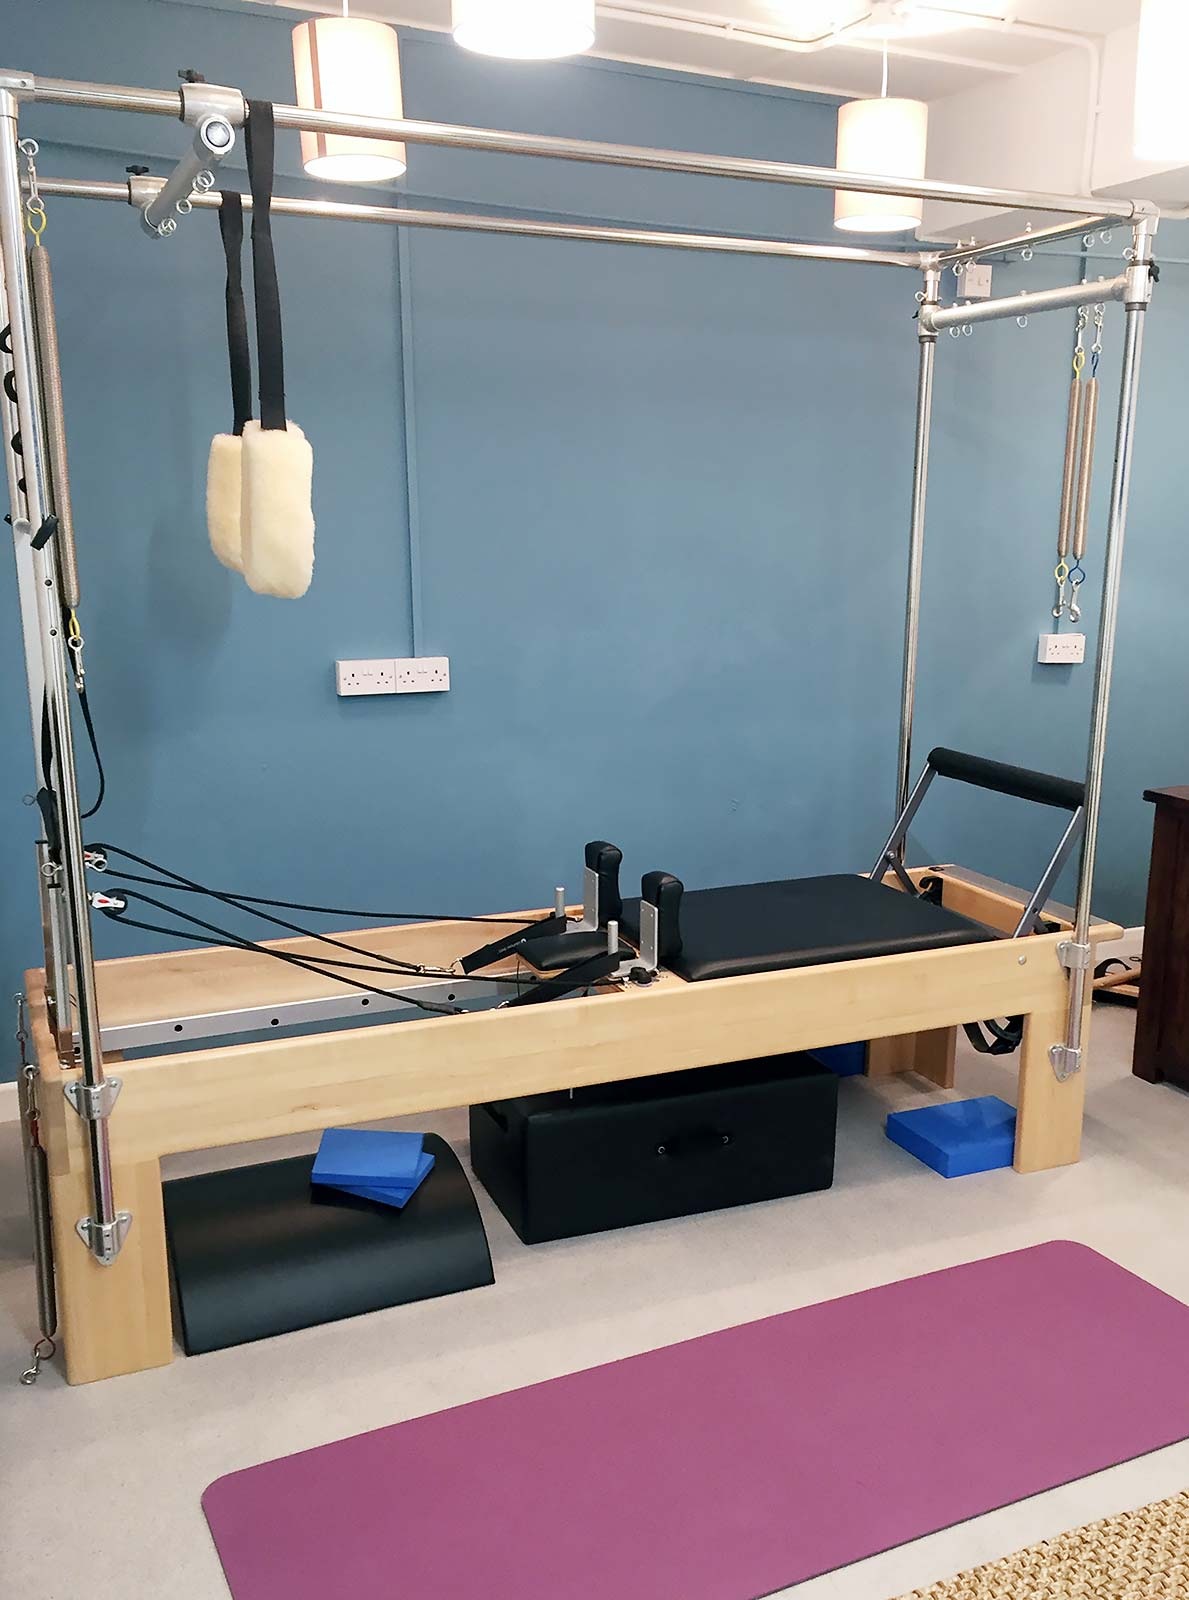 Pilates Reformer at The Studio @53